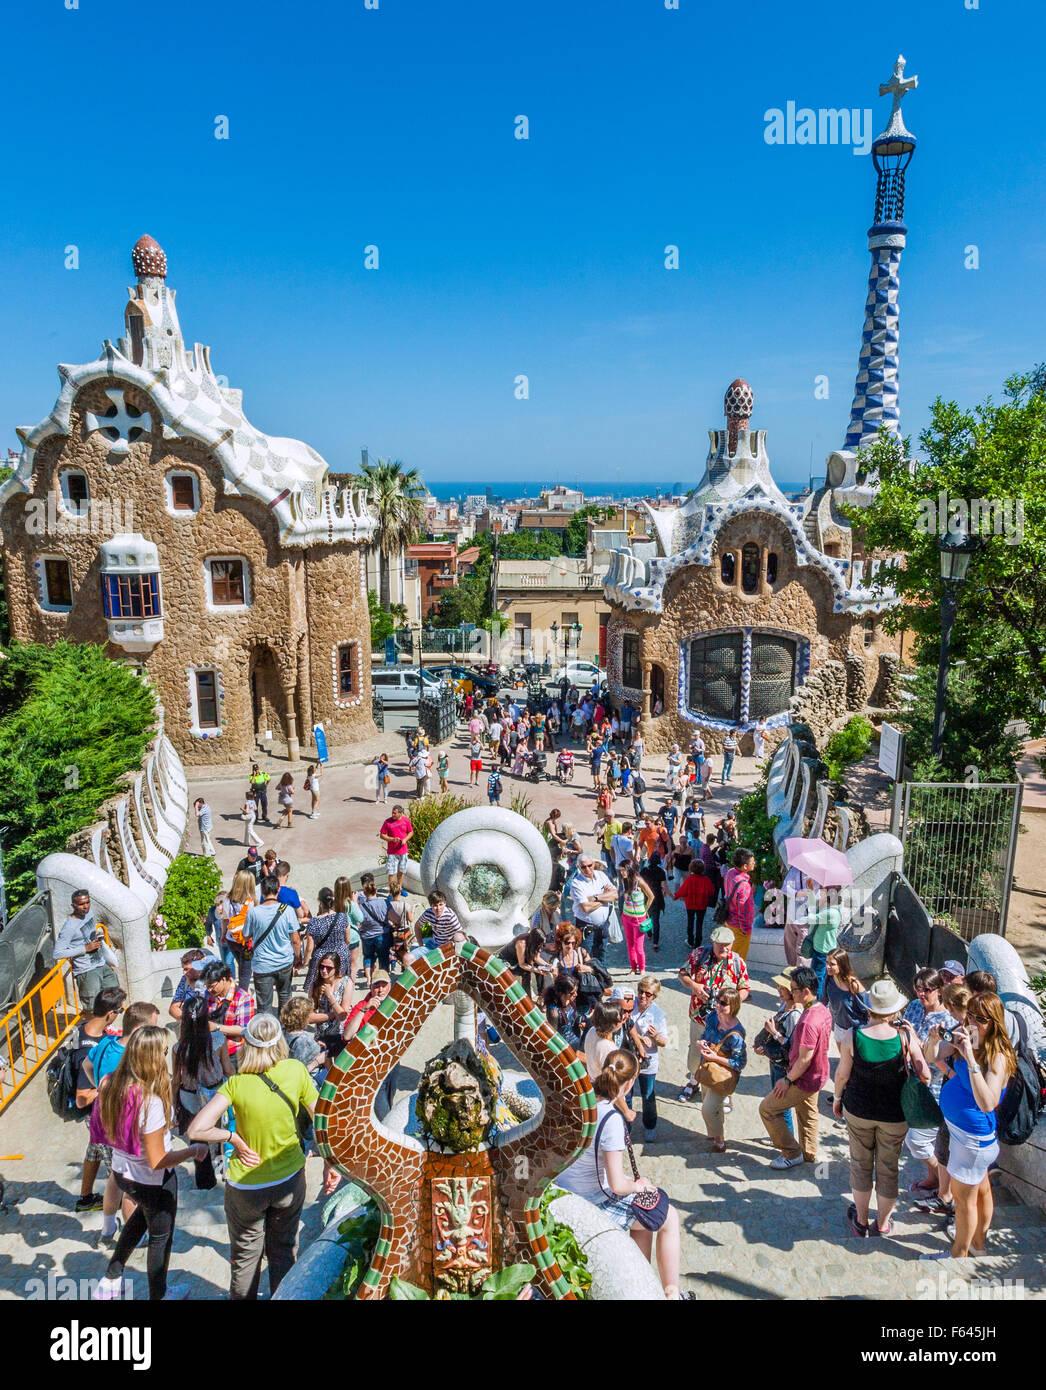 Spain, Catalonia, Barcelona, Gracia district, Park Güell, the dragon fountain at the park entrance is a popular - Stock Image